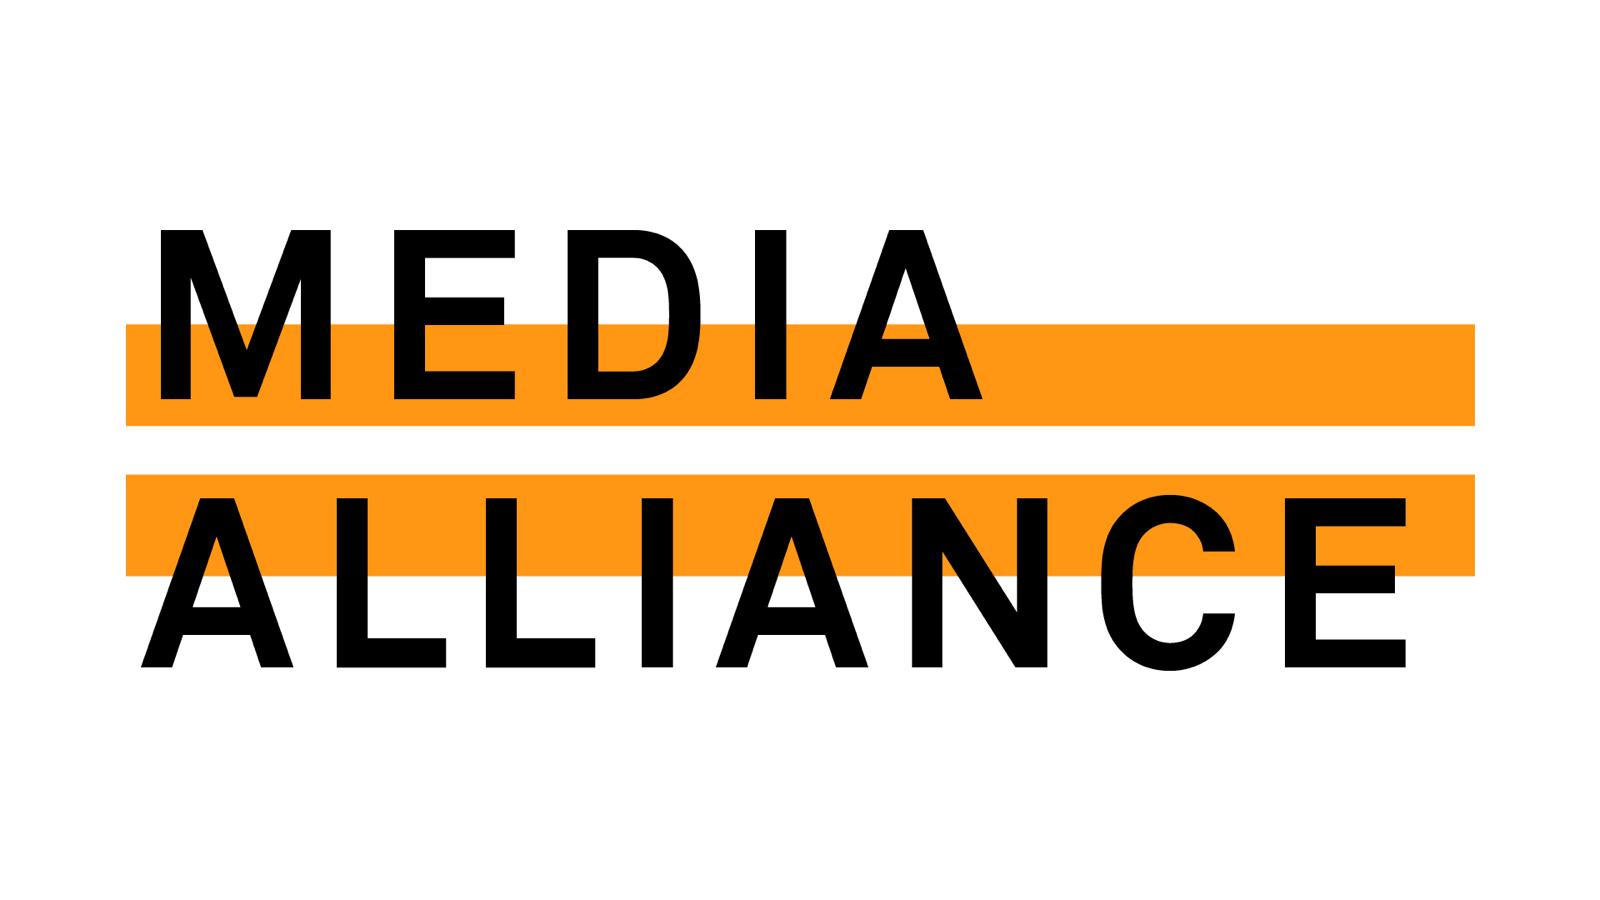 Media Alliance